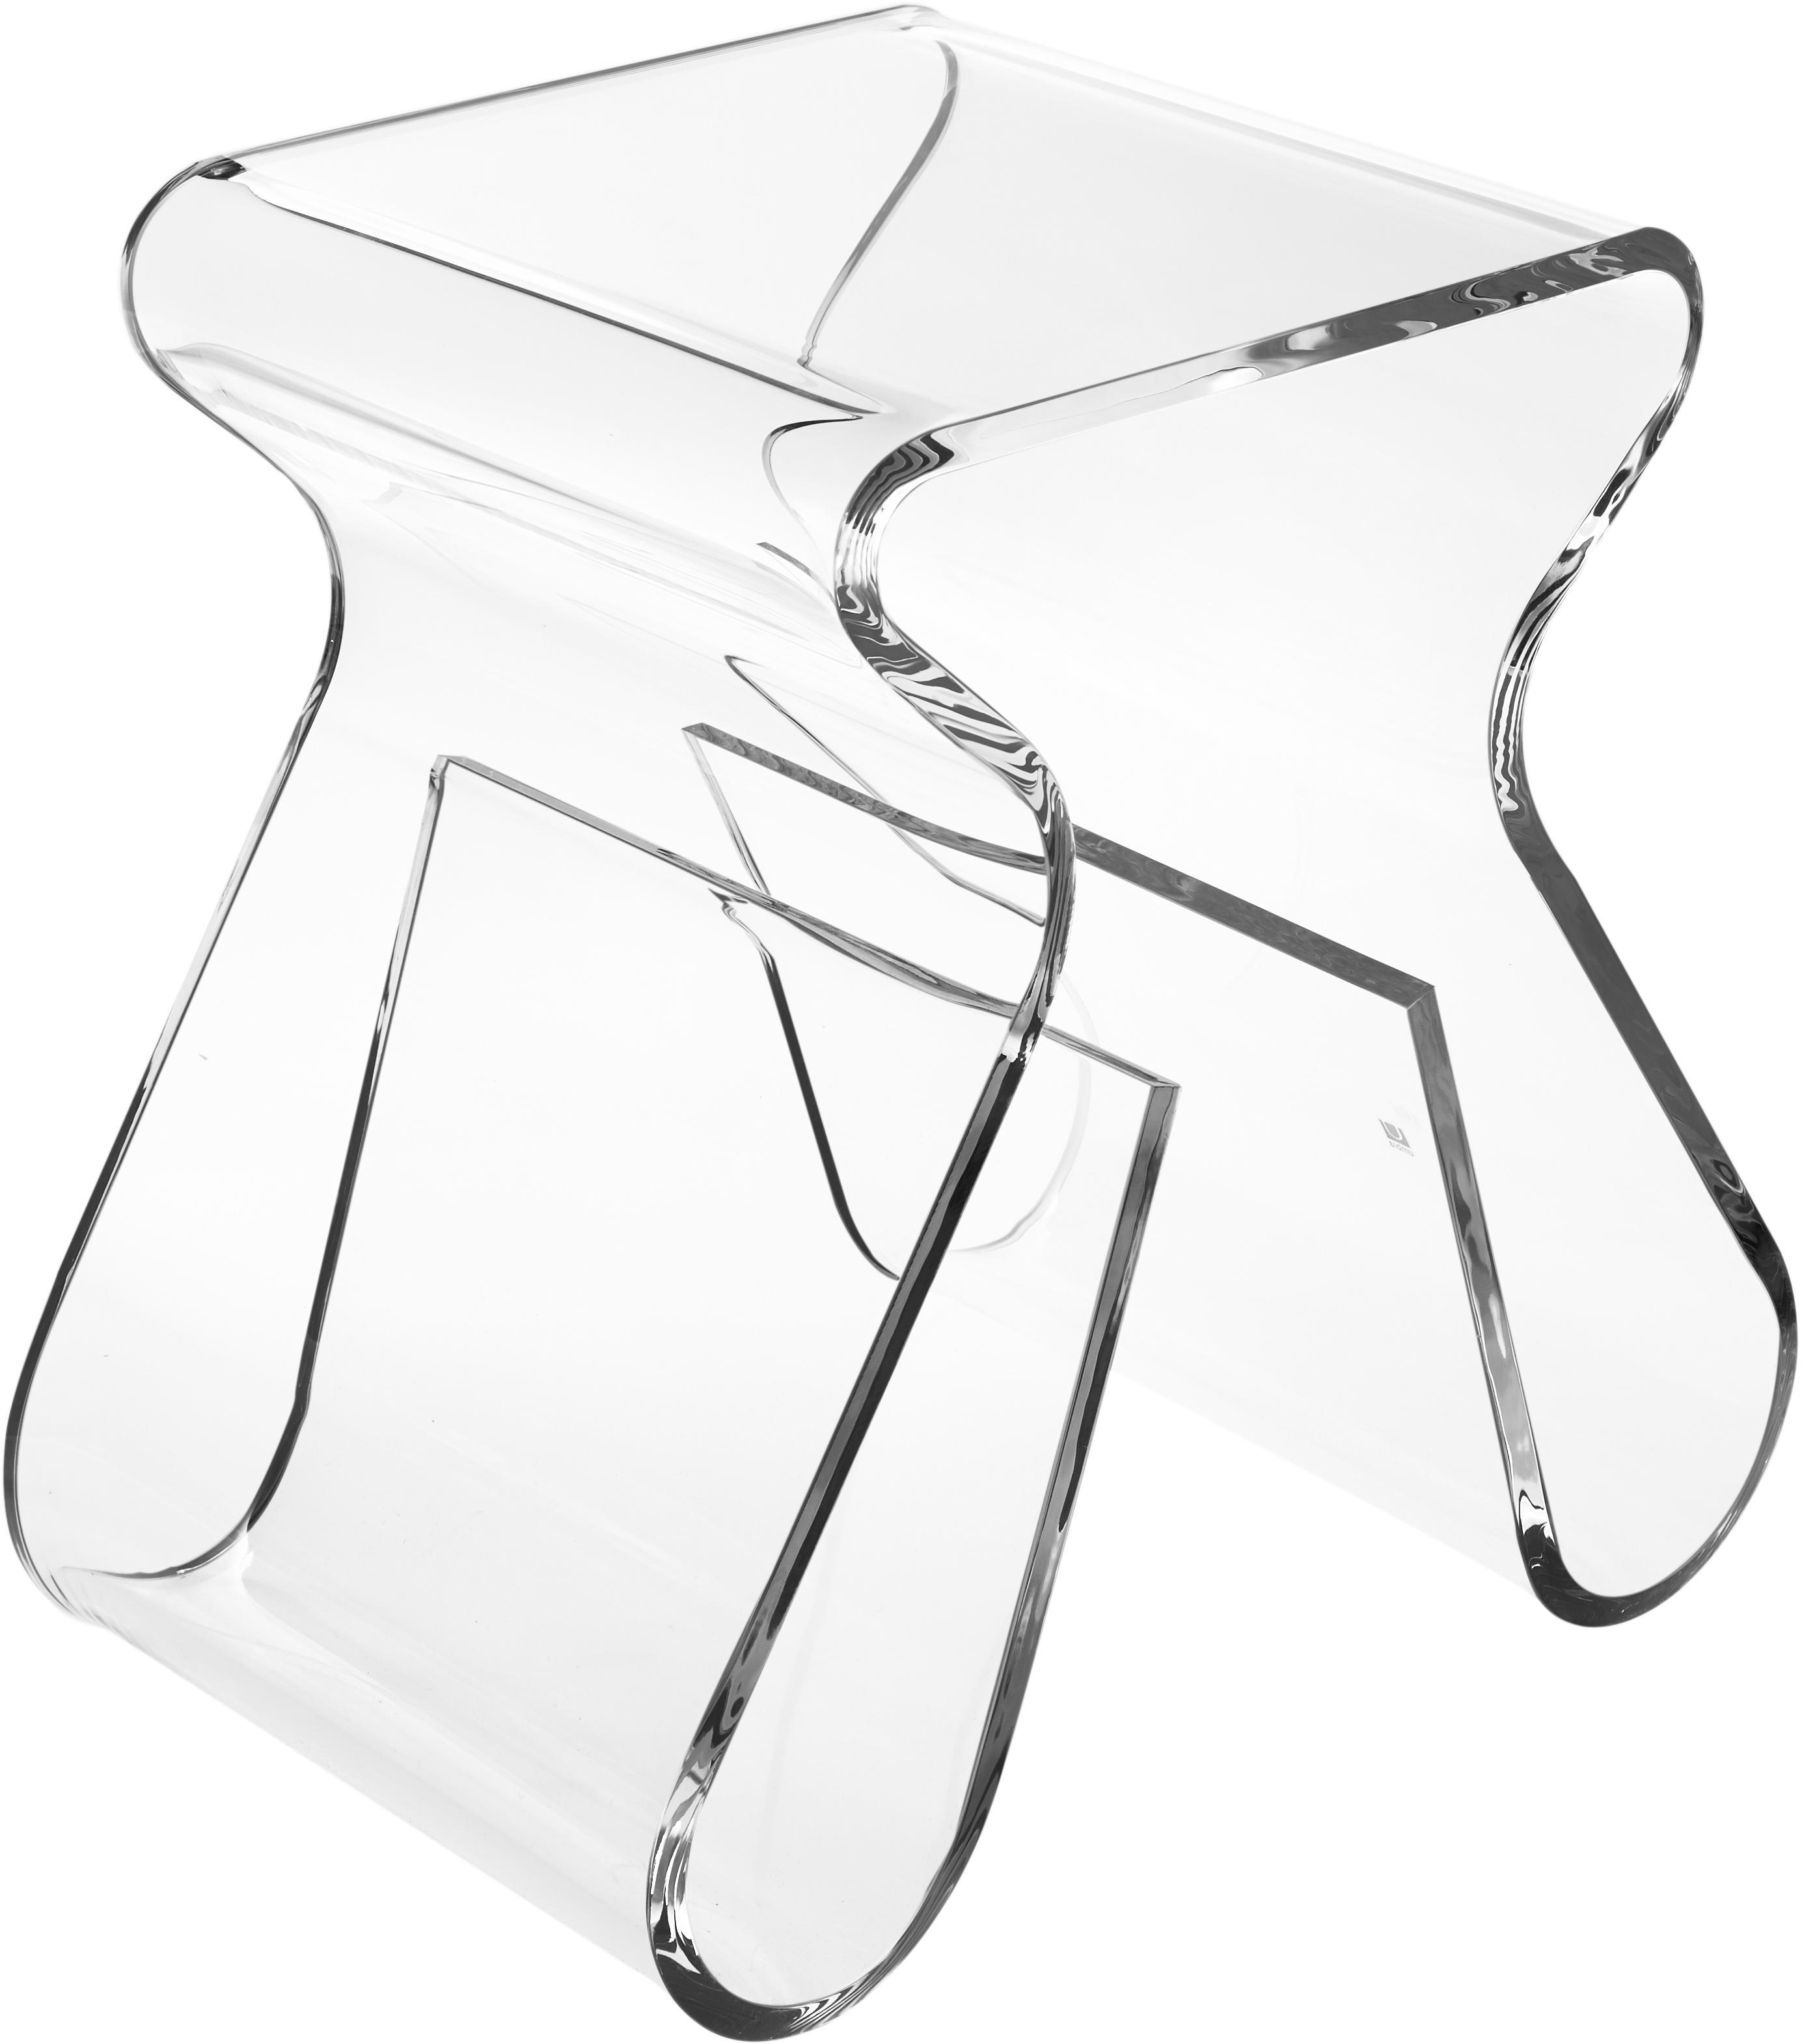 Sgabello trasparente Loop, Acrilico, Trasparente, Larg. 42 x Alt. 43 cm